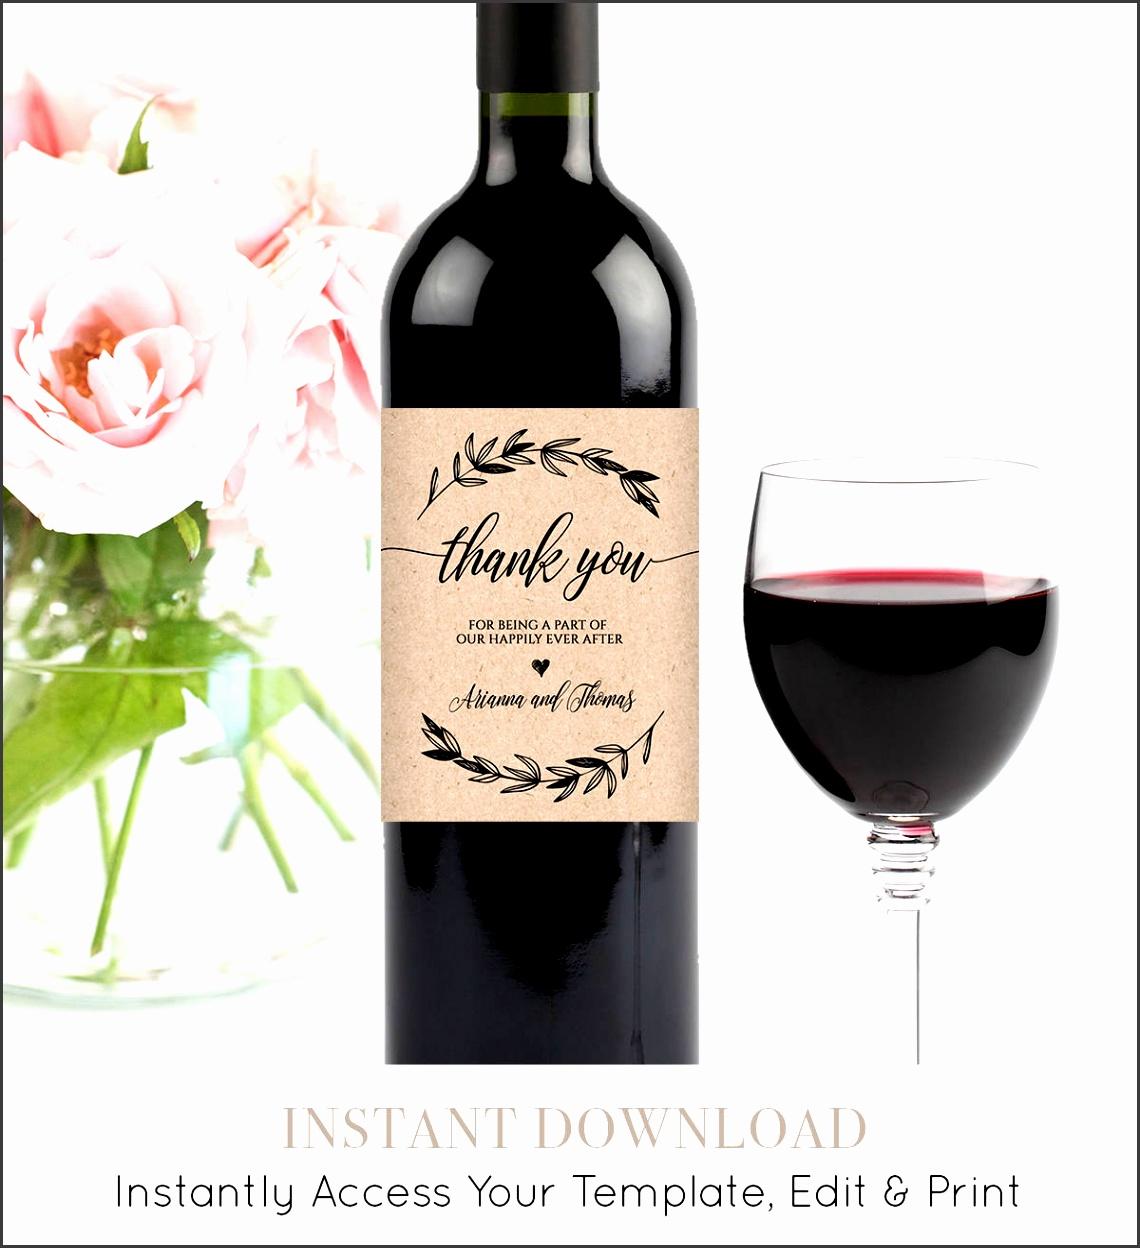 Wedding Wine Bottle Label Printable Wine Label Template Editable Wine Wedding Favor Custom Label Instant Download DIY 023 102WL